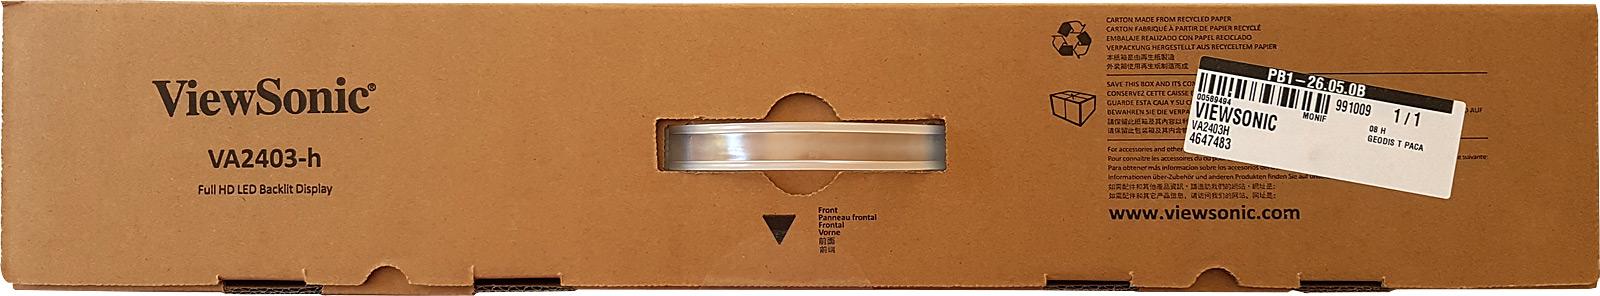 Carton du Viewsonic VA2403-h